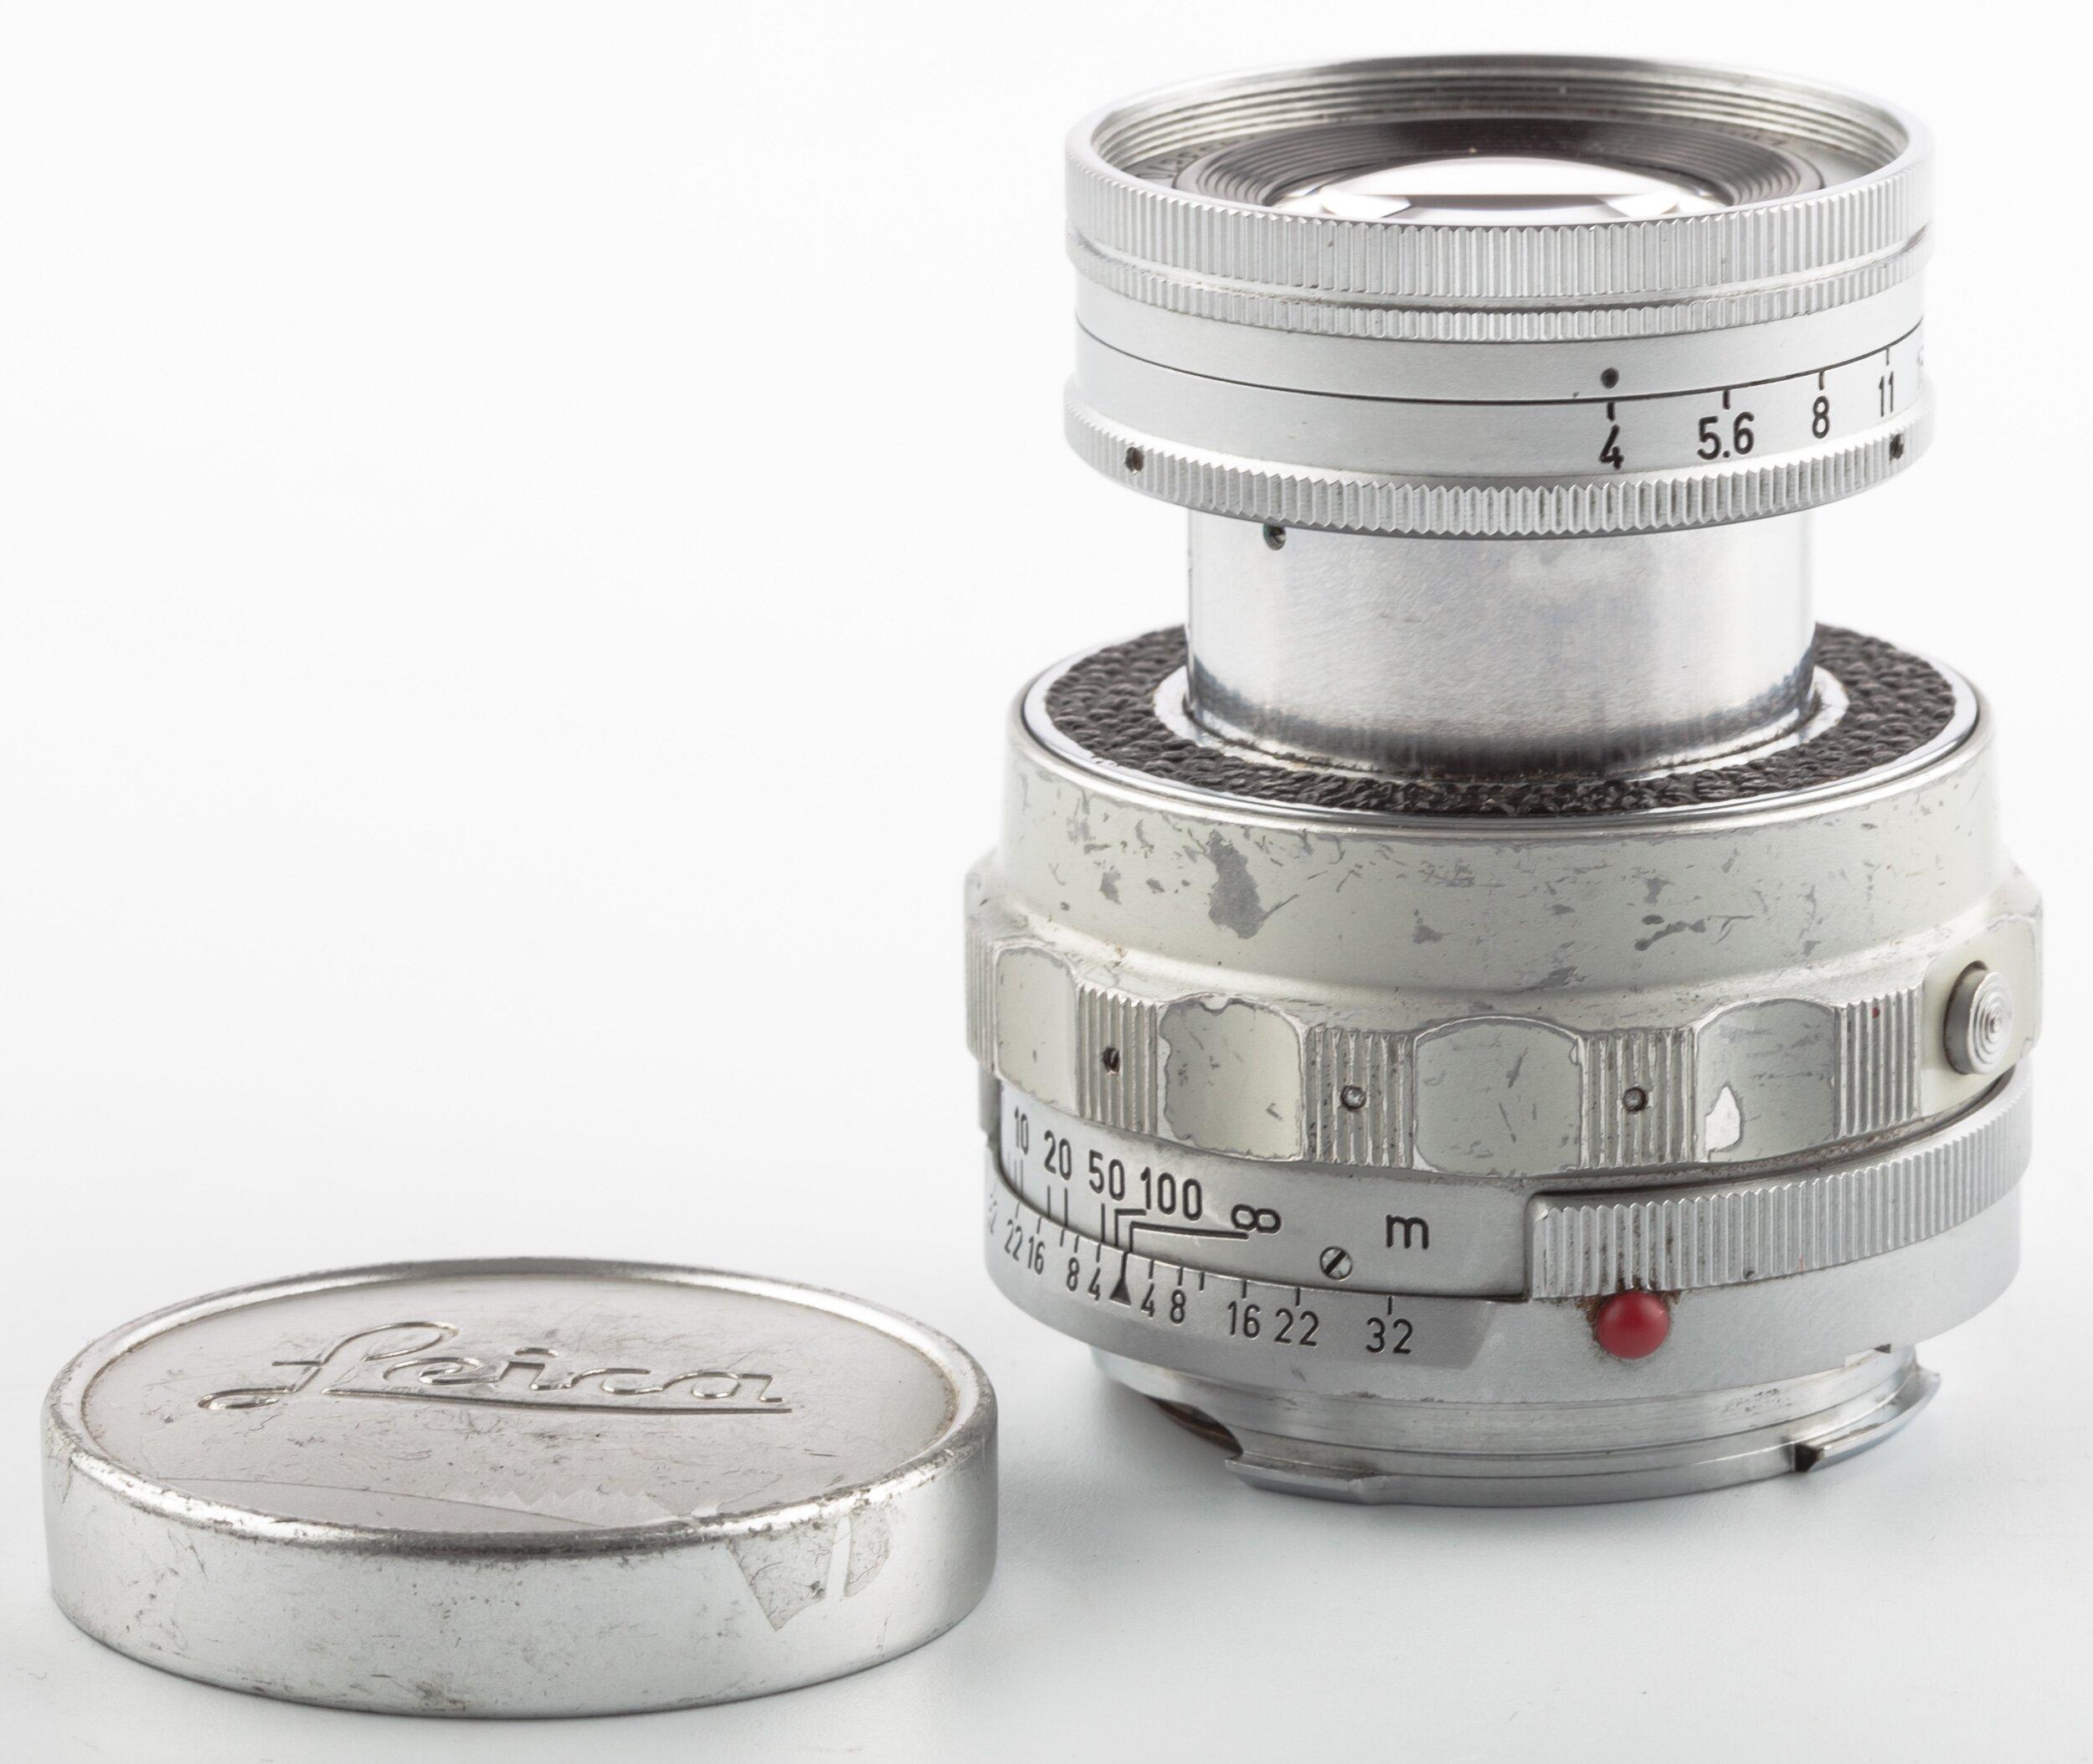 Leitz Leica M Elmar 9cm 4.0 collapsible Silver